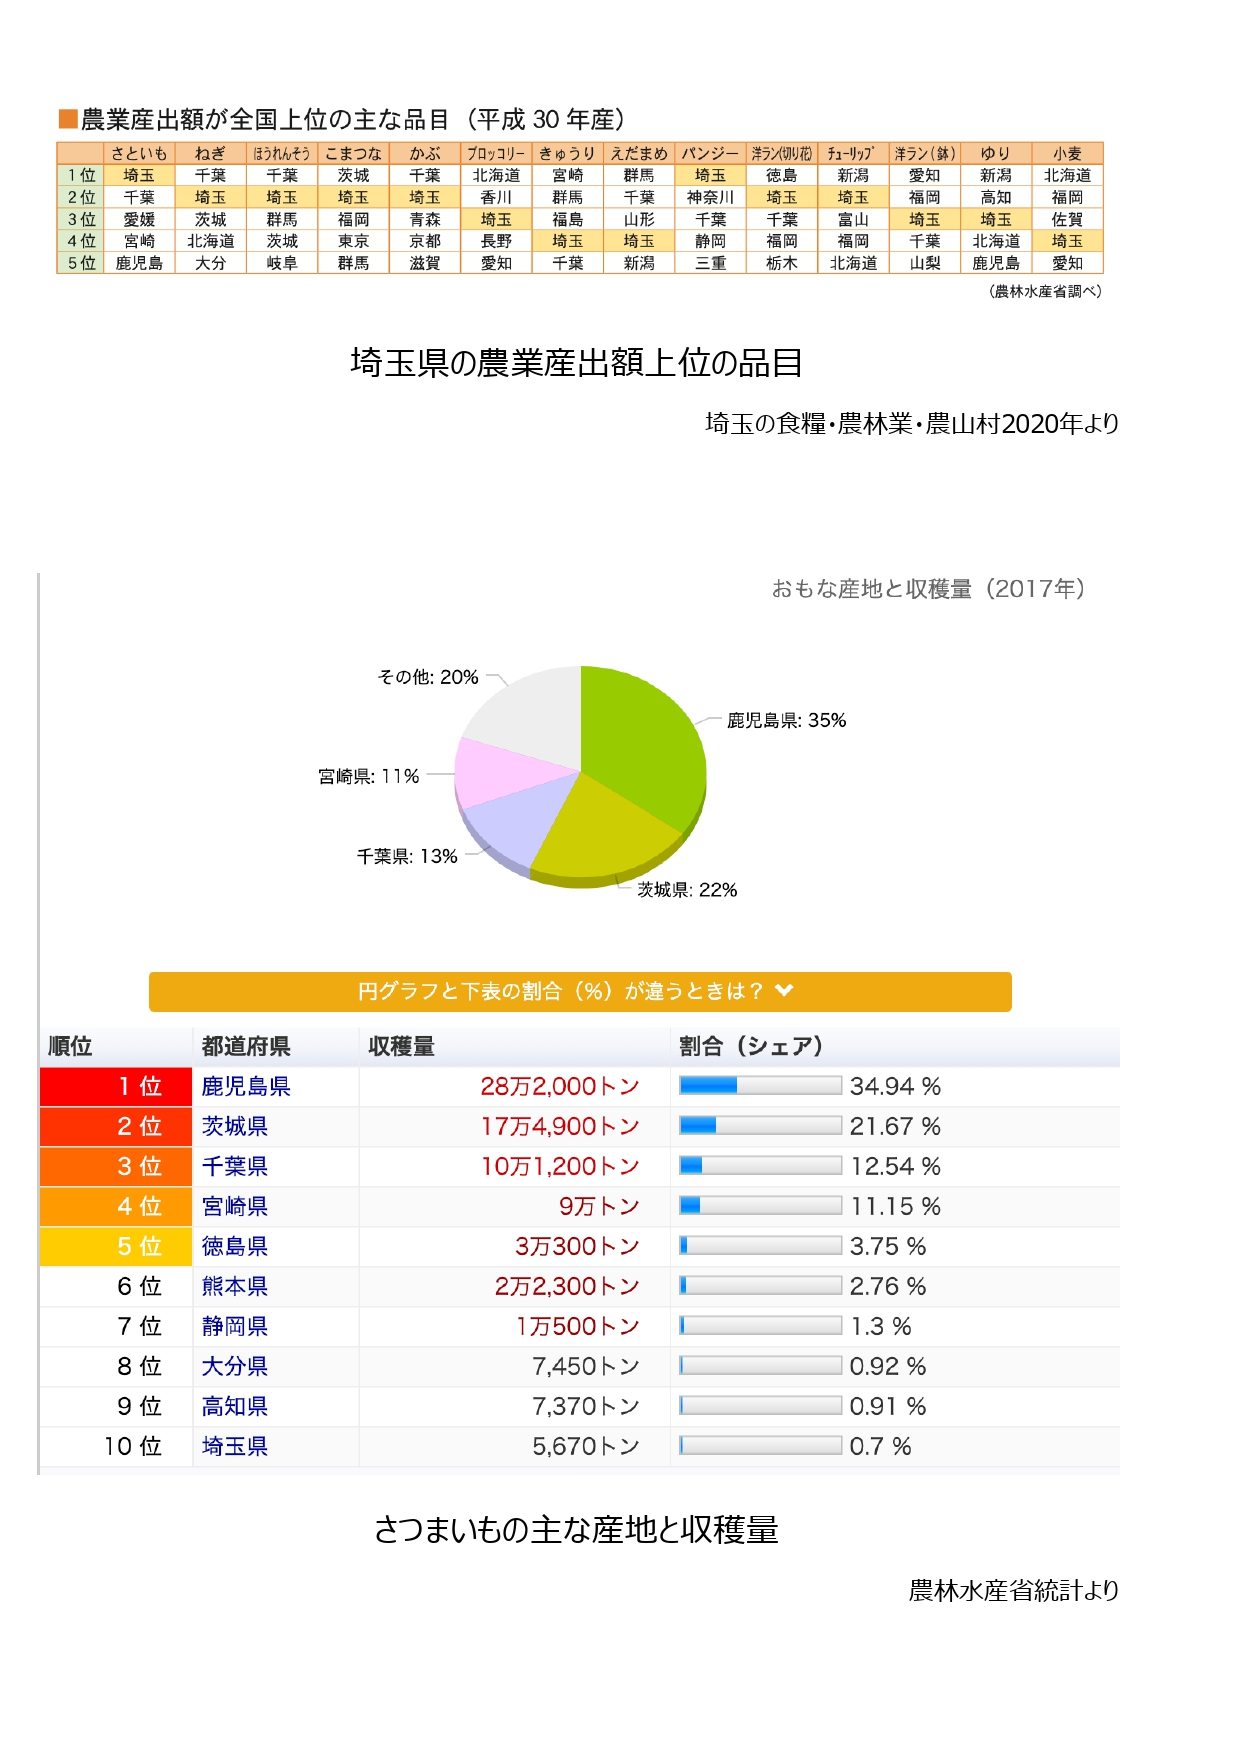 3_%e8%b3%87%e6%96%993%e5%9f%bc%e7%8e%89%e3%81%ae%e4%b8%bb%e8%a6%81%e8%be%b2%e7%94%a3%e7%89%a9%e3%81%a8%e3%81%95%e3%81%a4%e3%81%be%e3%81%84%e3%82%82%e3%81%ae%e4%b8%bb%e3%81%aa%e7%94%a3%e5%9c%b0